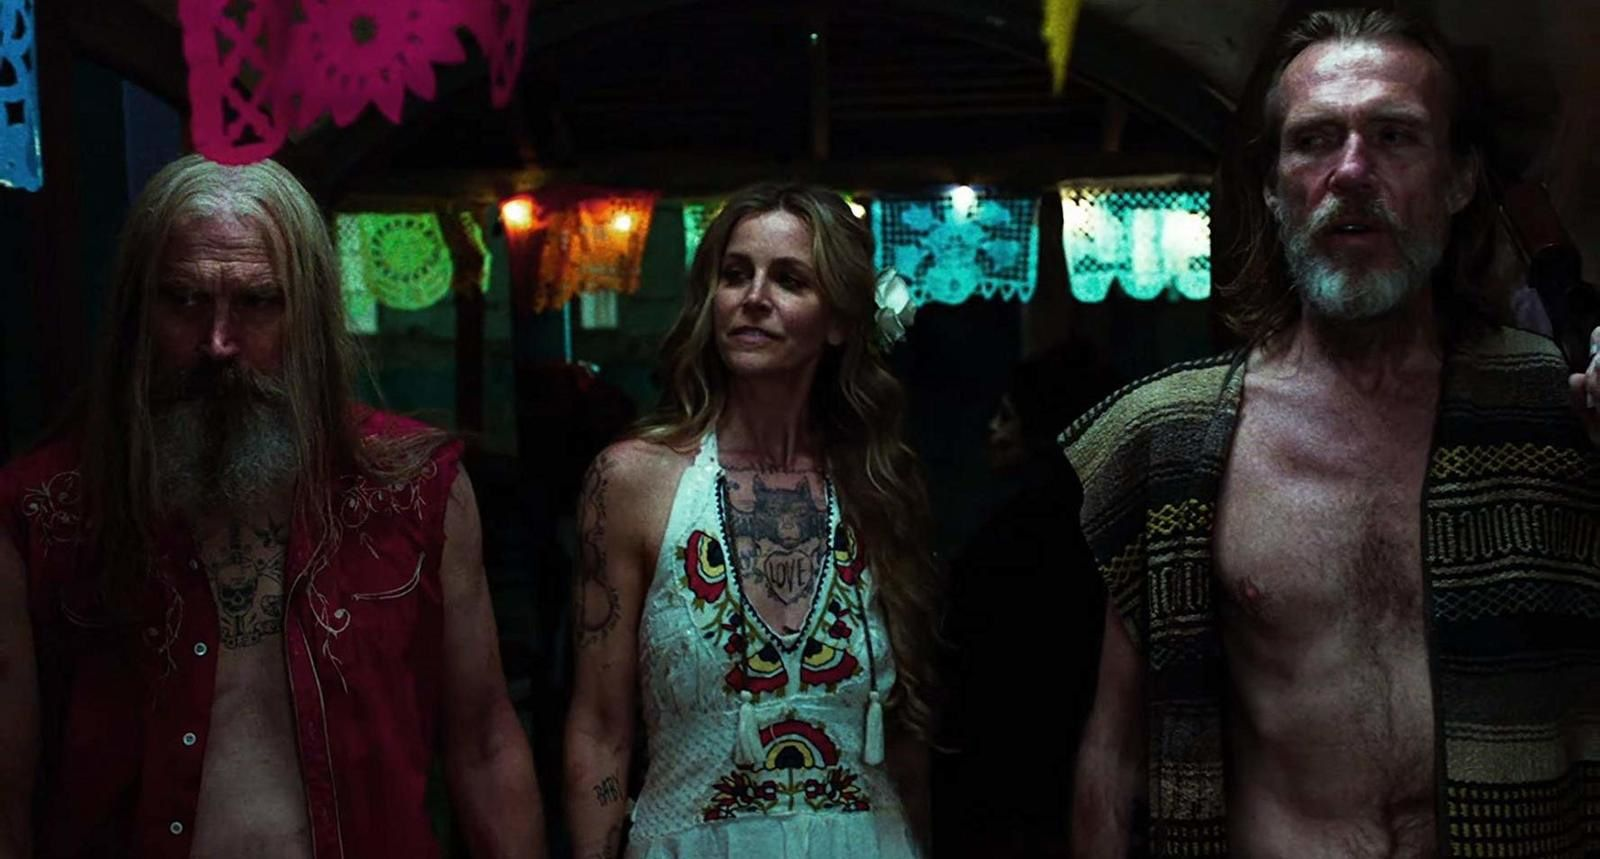 3 From Hell (BANDE-ANNONCE) de Rob Zombie avec Sheri Moon Zombie, Sid Haig, Danny Trejo